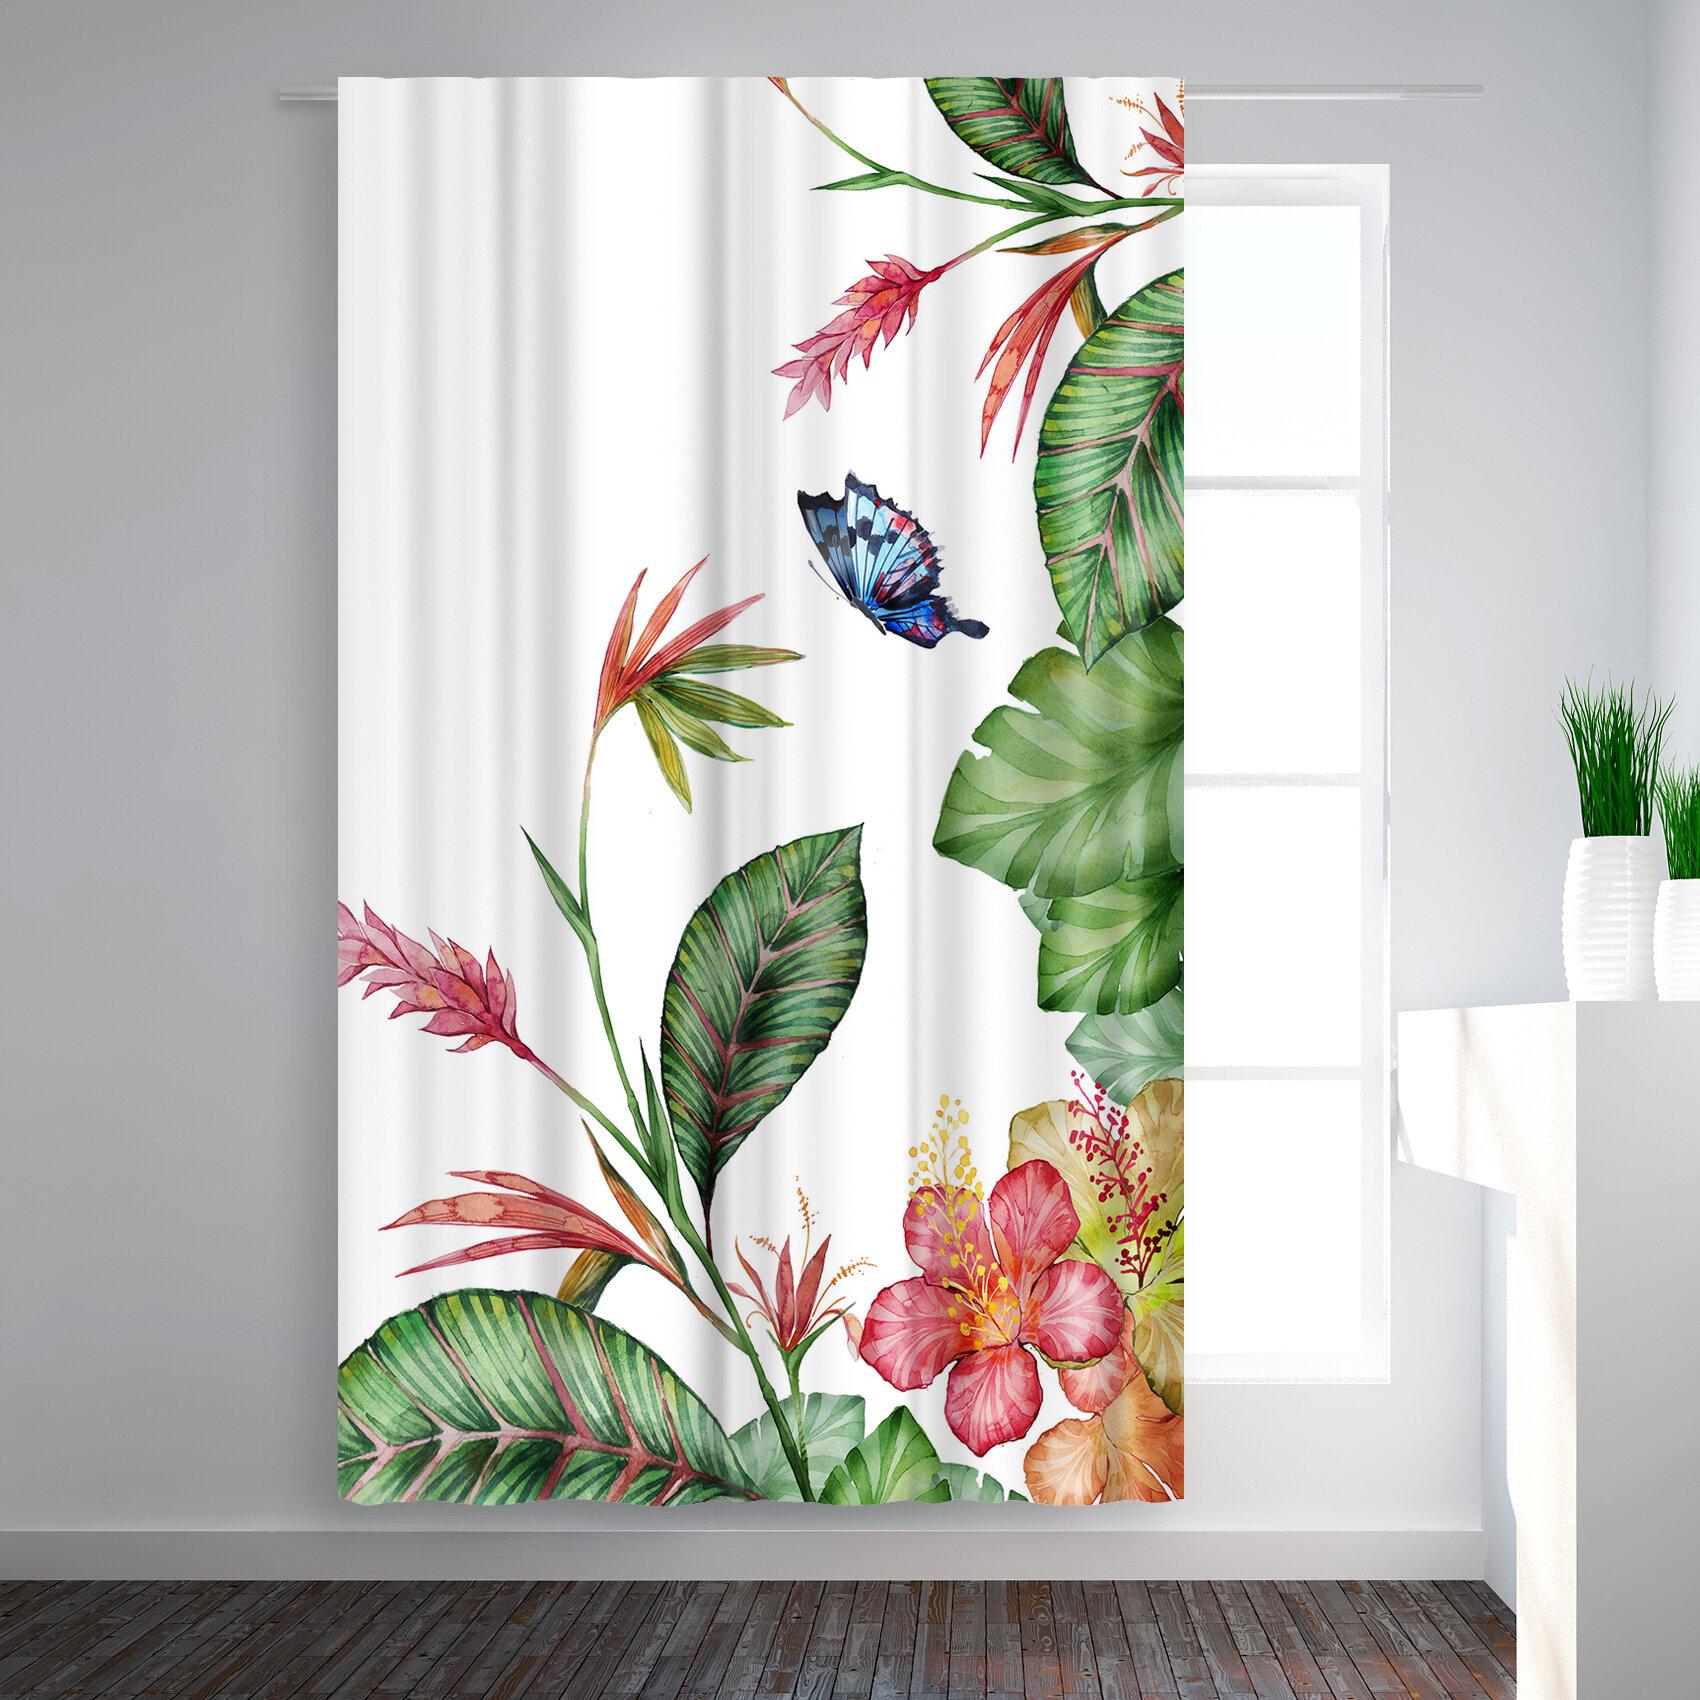 East Urban Home Victoria Nelson Tropical Floral Blackout Rod Pocket Single Curtain Panel Wayfair